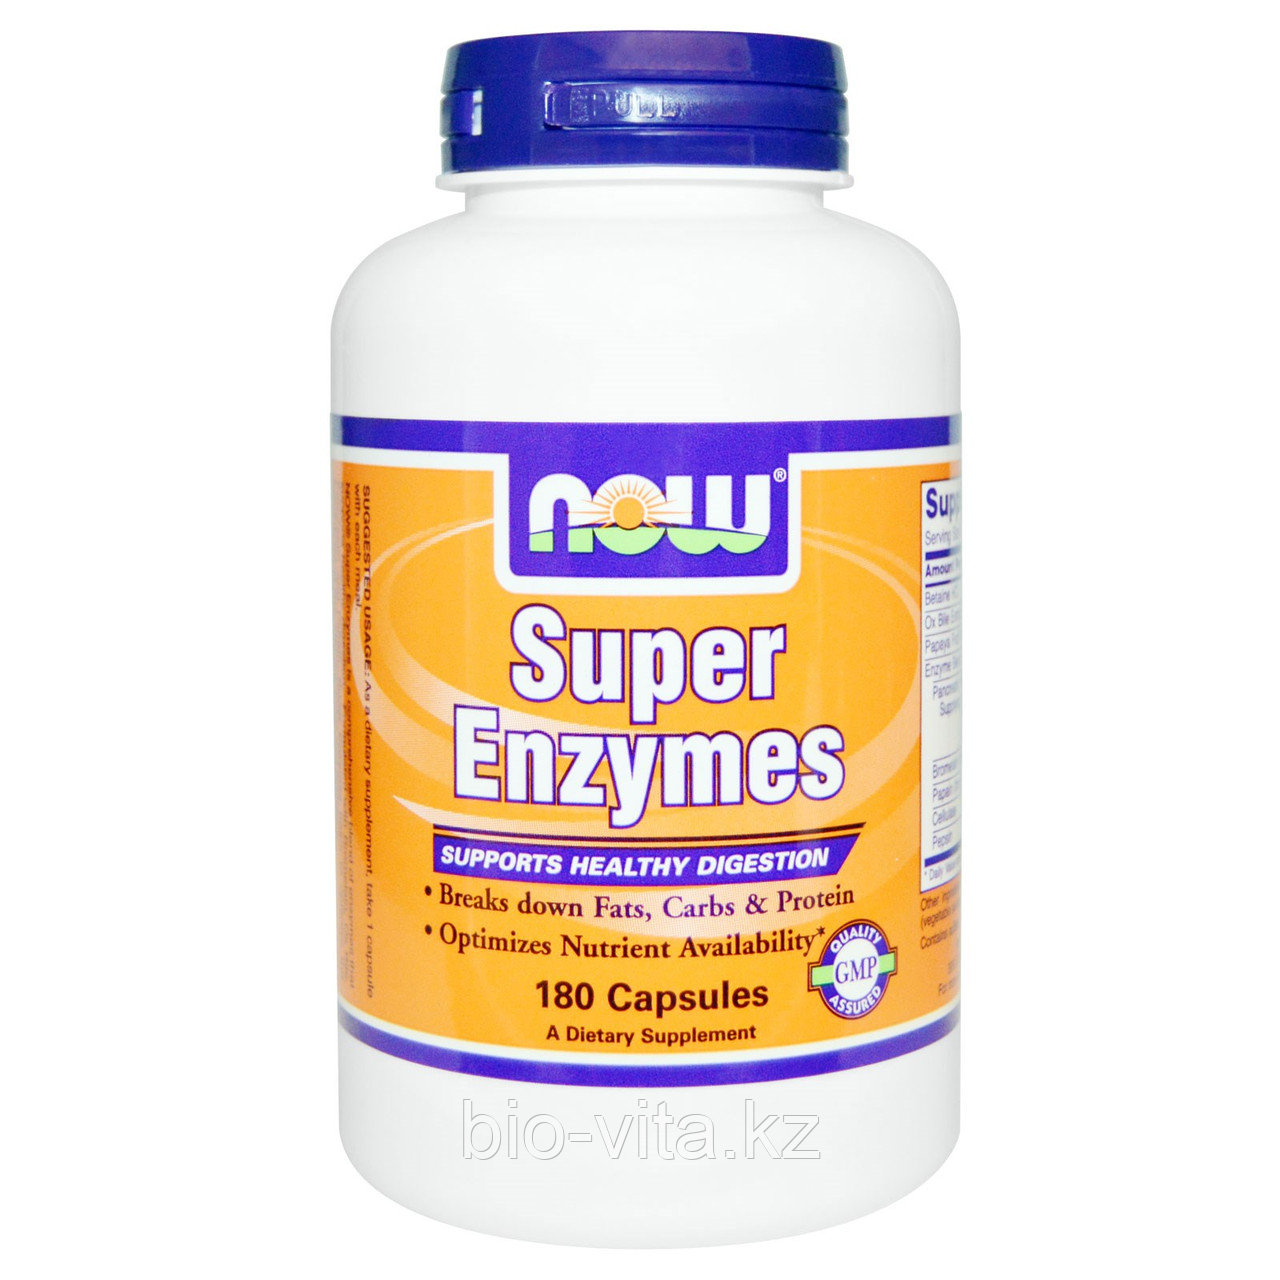 Супер ферменты.Содержат животный фермент панкреатин.  Now Foods, Super Enzymes, 180 Capsules